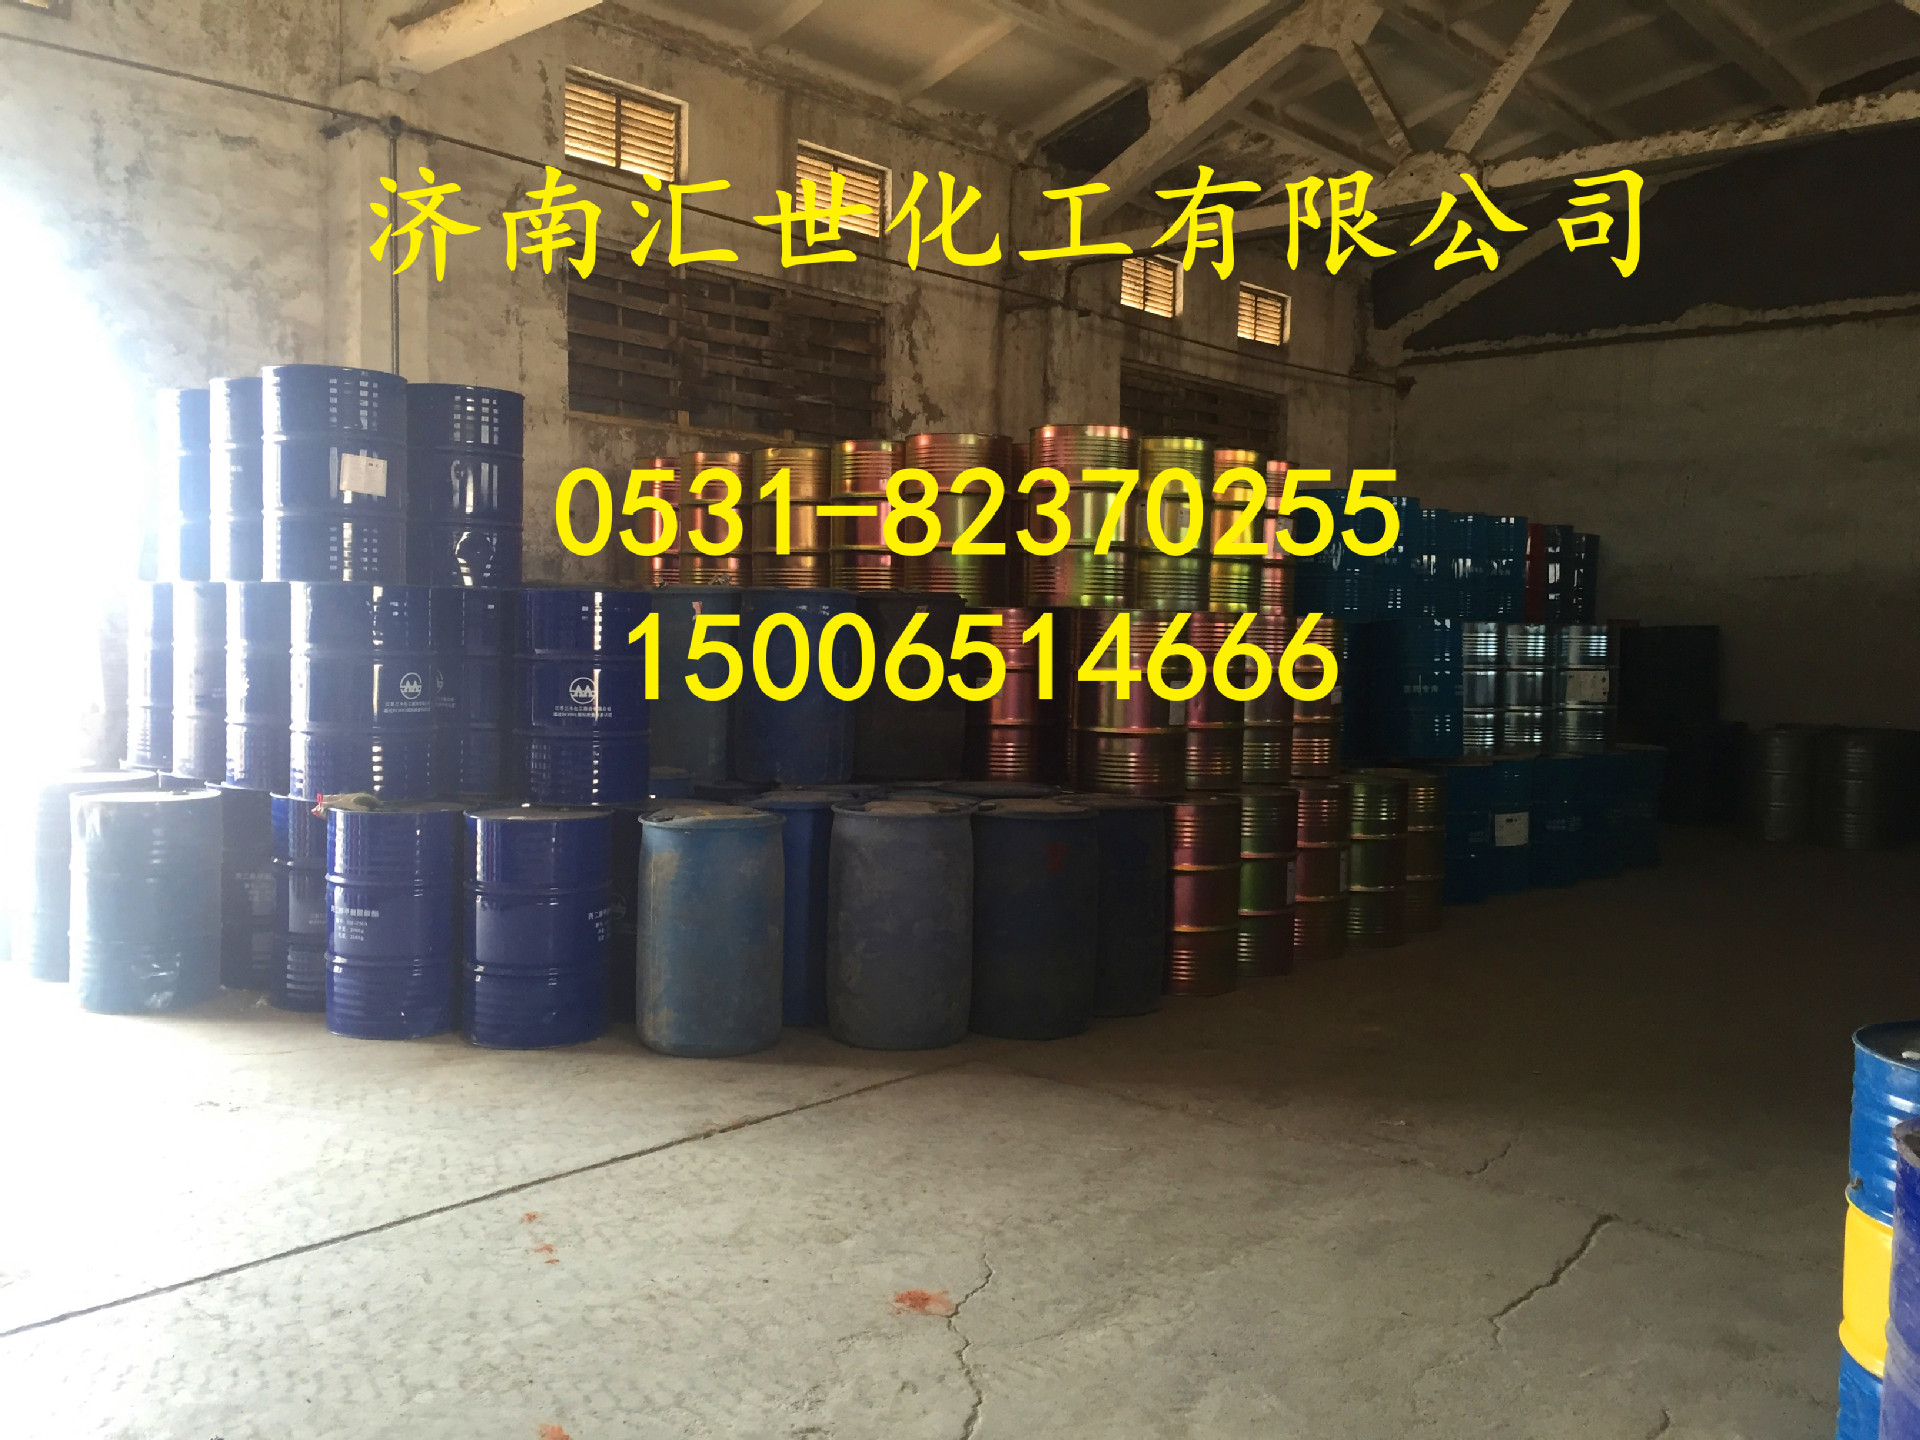 Nhóm hữu cơ (Hydrôcacbon)  GB dichloromethane manufacturers selling 99.99% of methylene chloride and